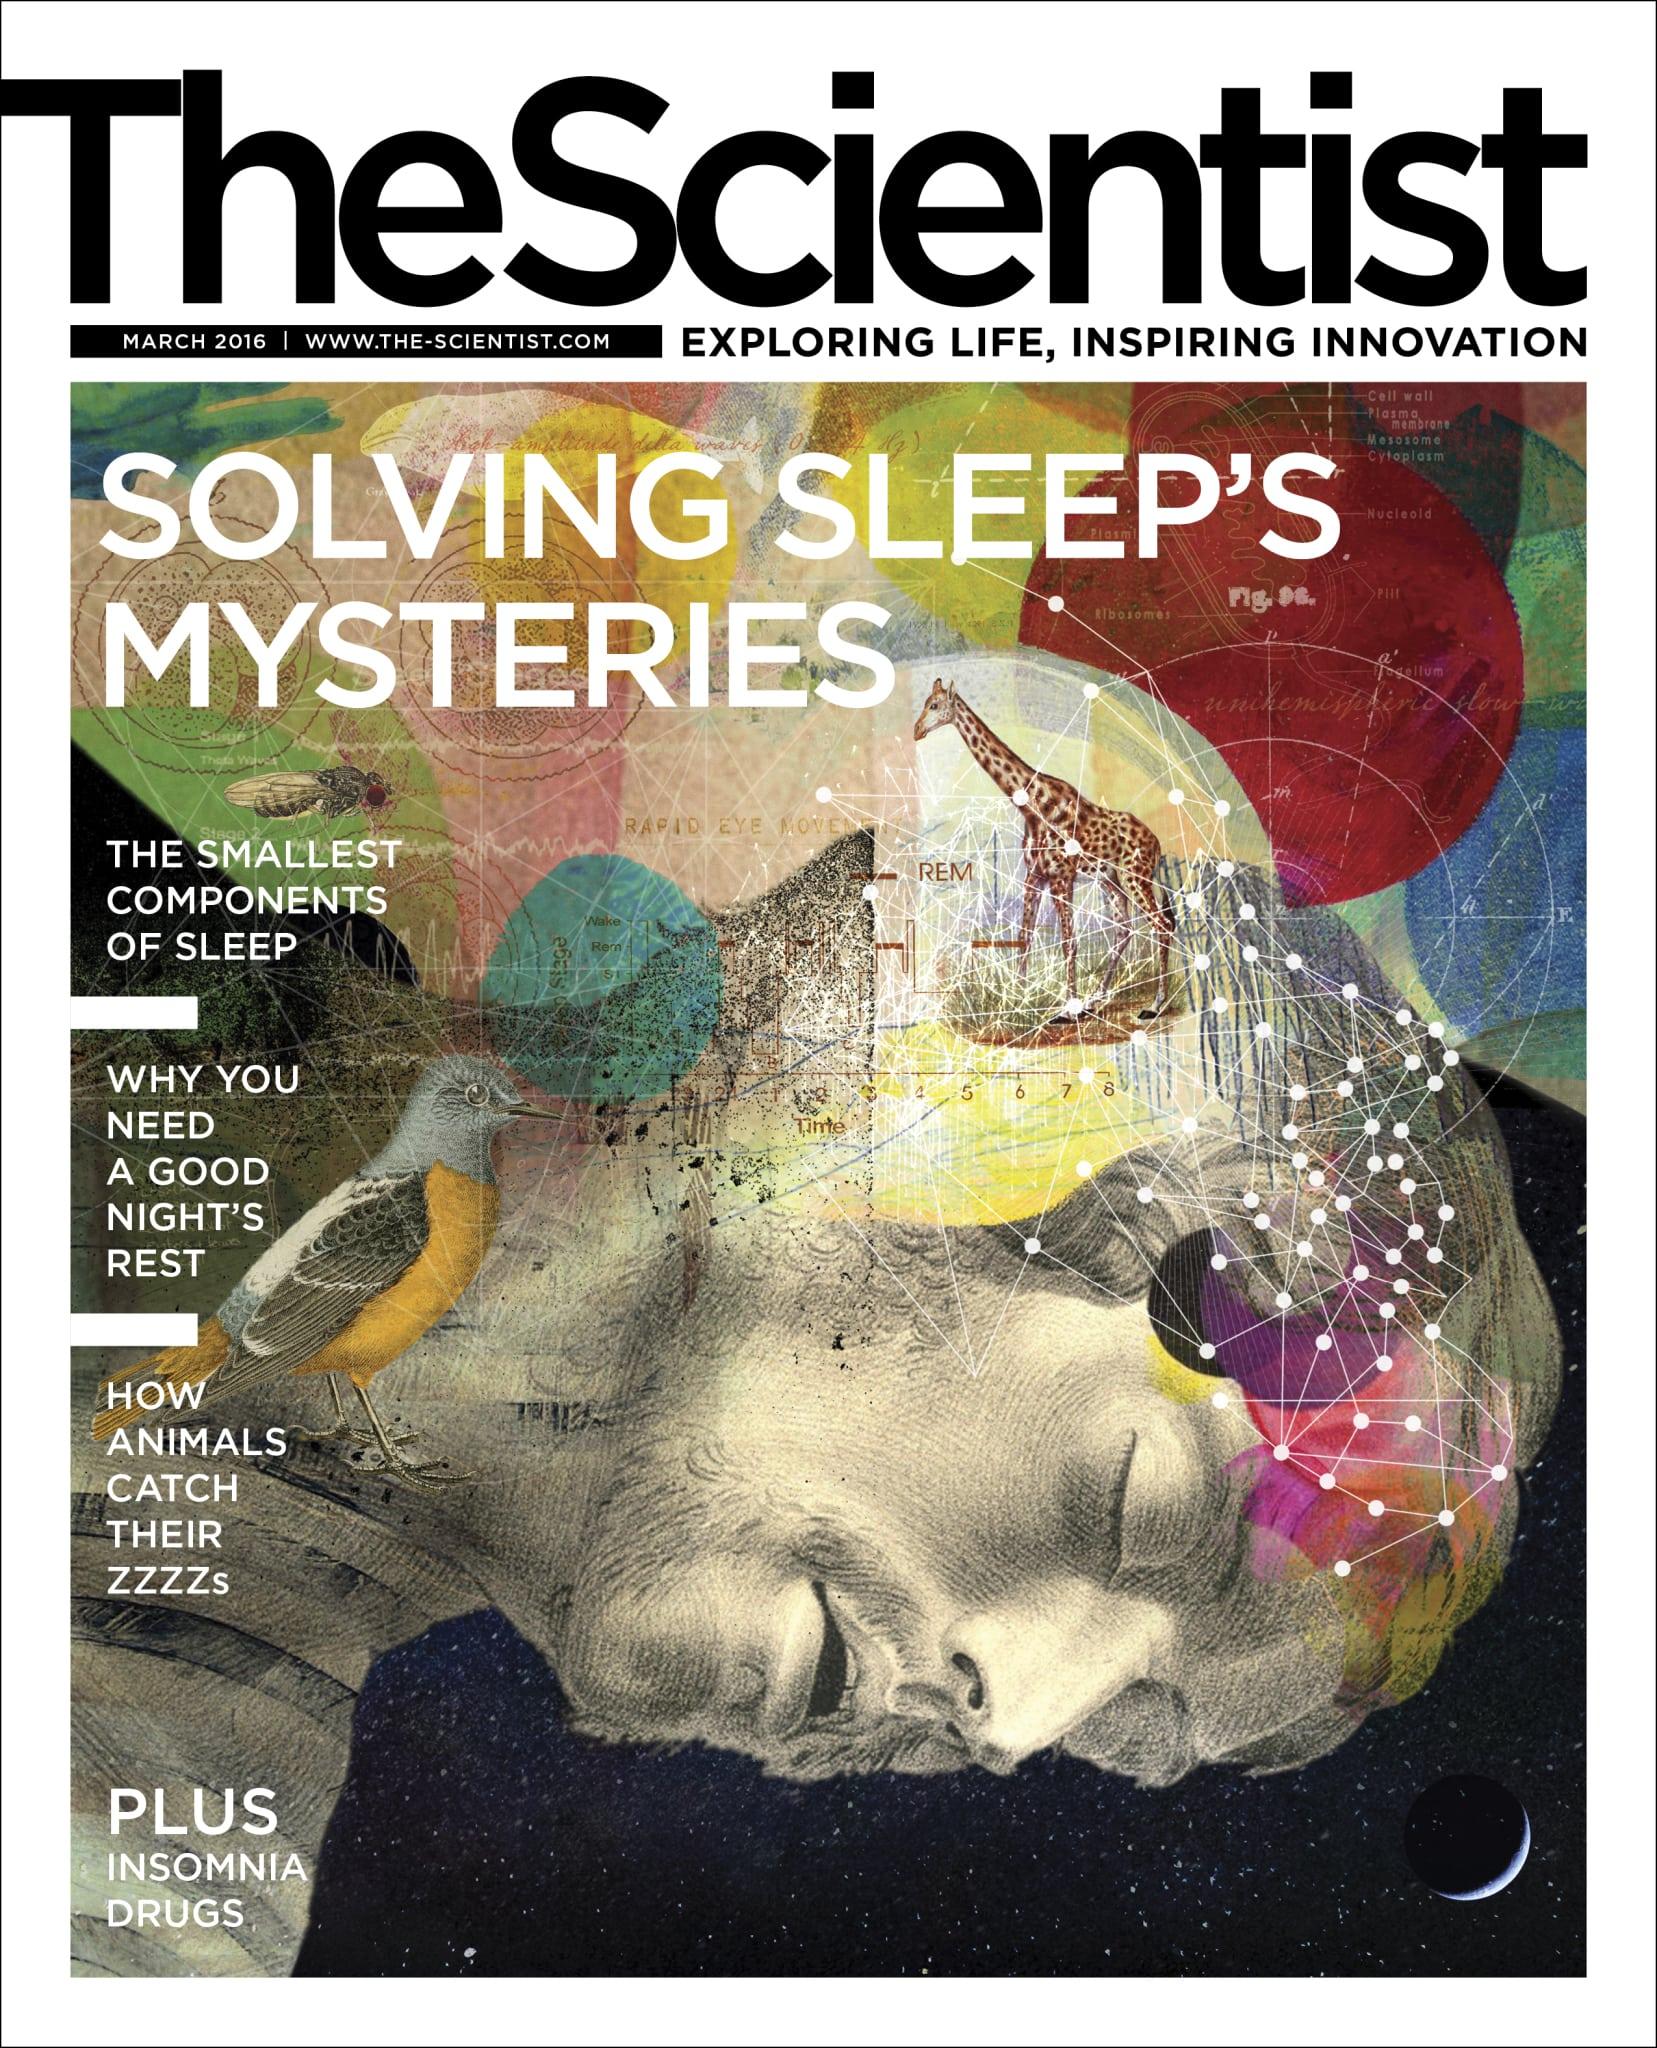 THE_SCIENTIST_B2B_Full_Issue_Eddies